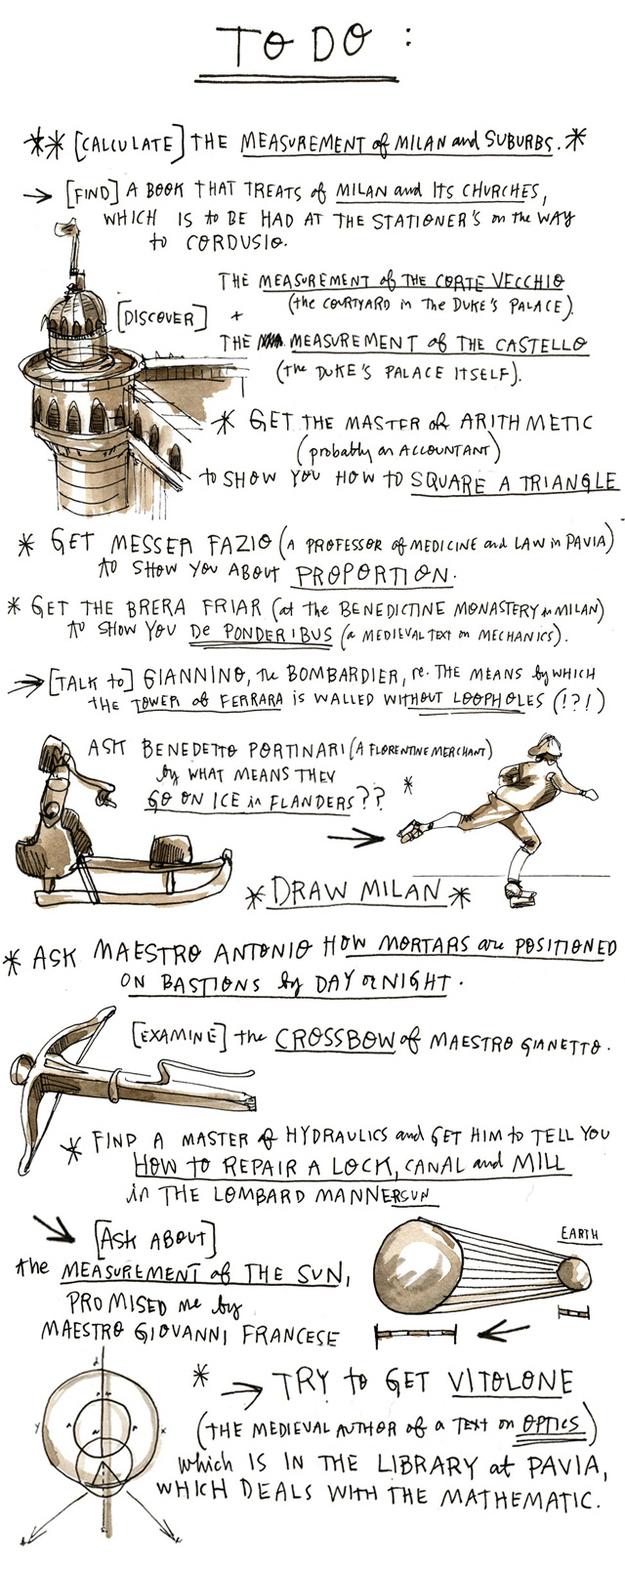 Leonardo da Vinci's To-Do List